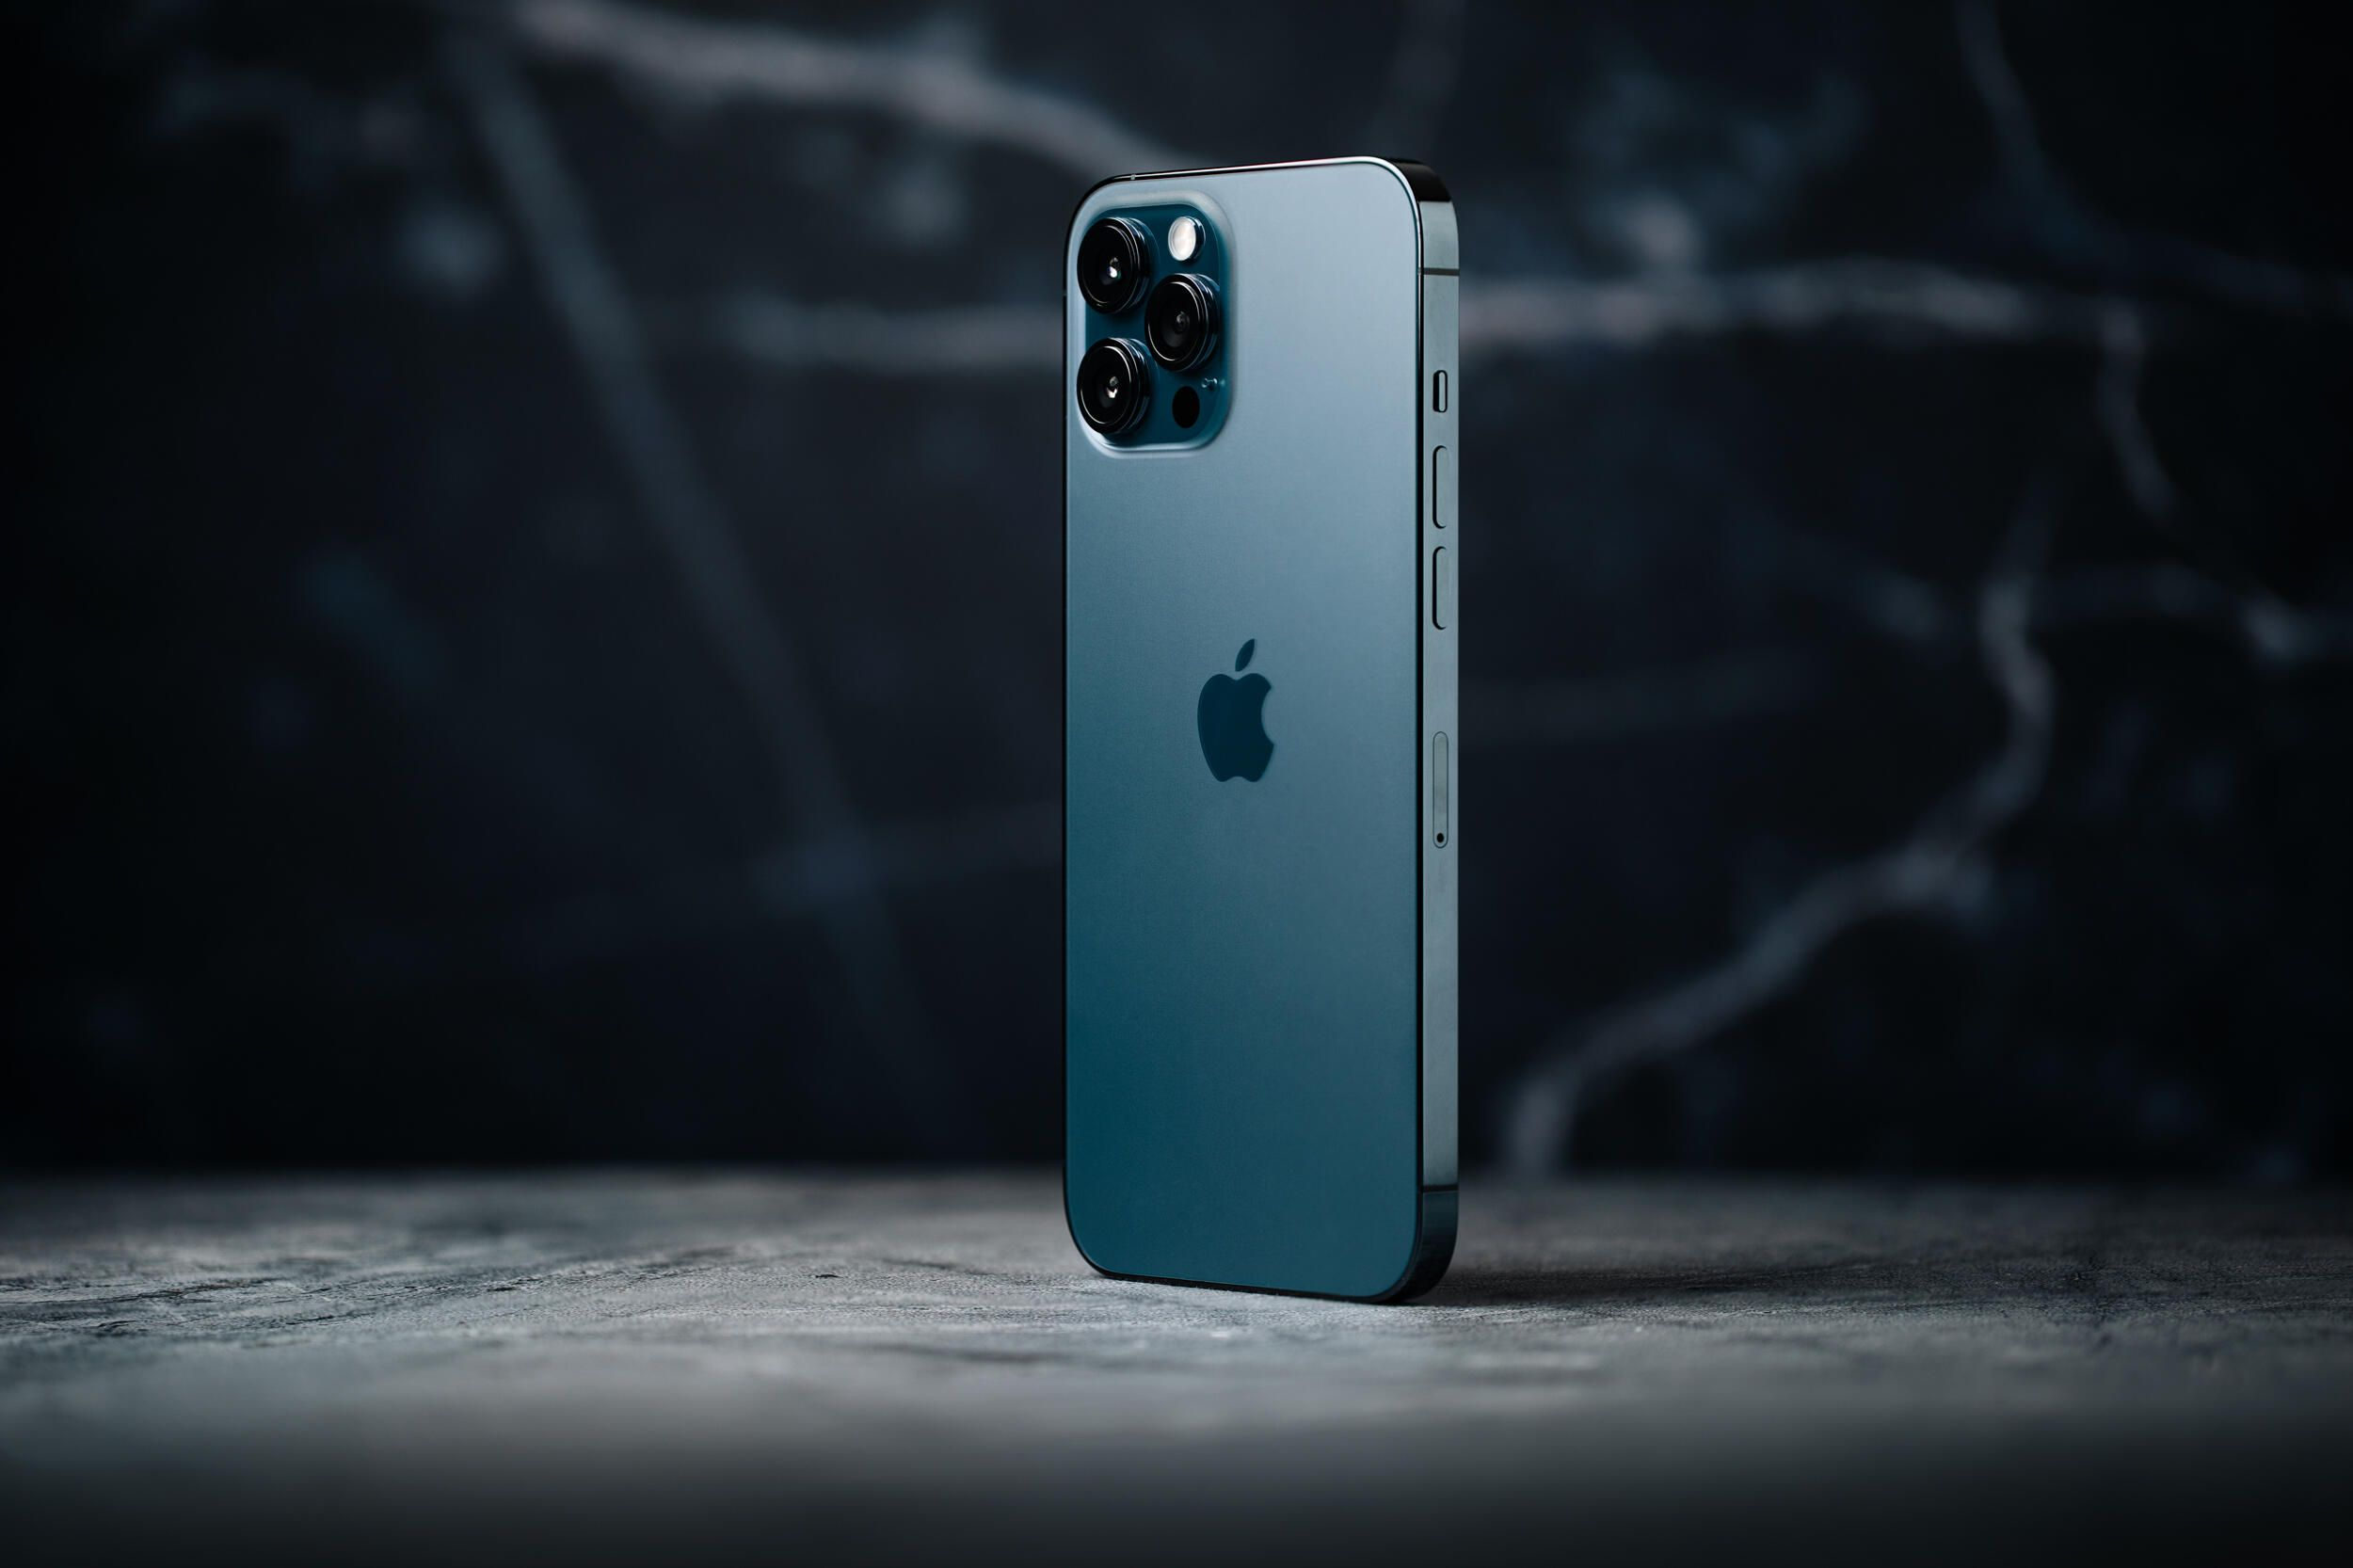 iphone-12-pro-max-hoyle-producto-hero-2